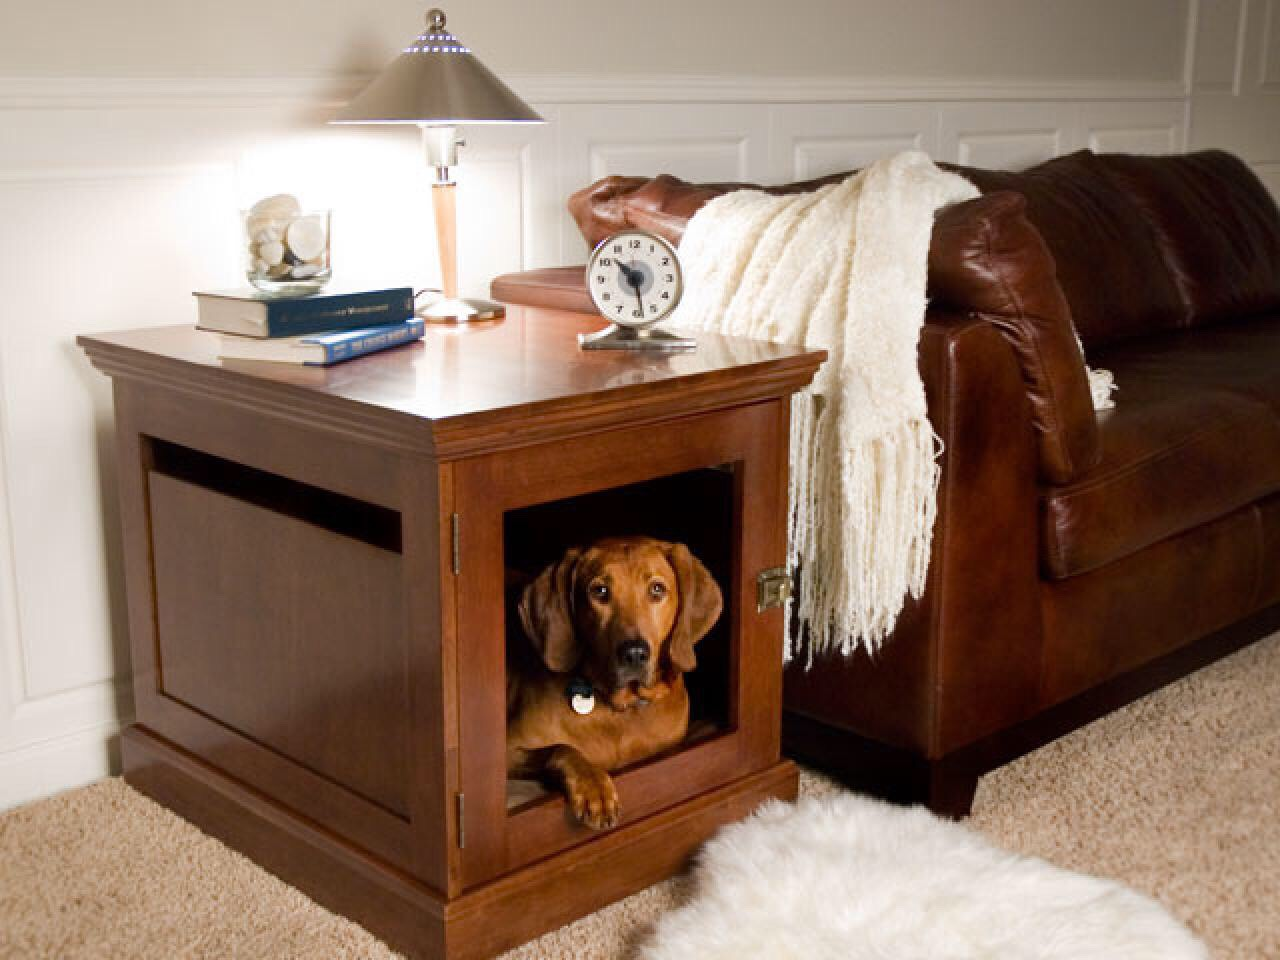 Indoor dog house - Dog For Indoors Noten Animals